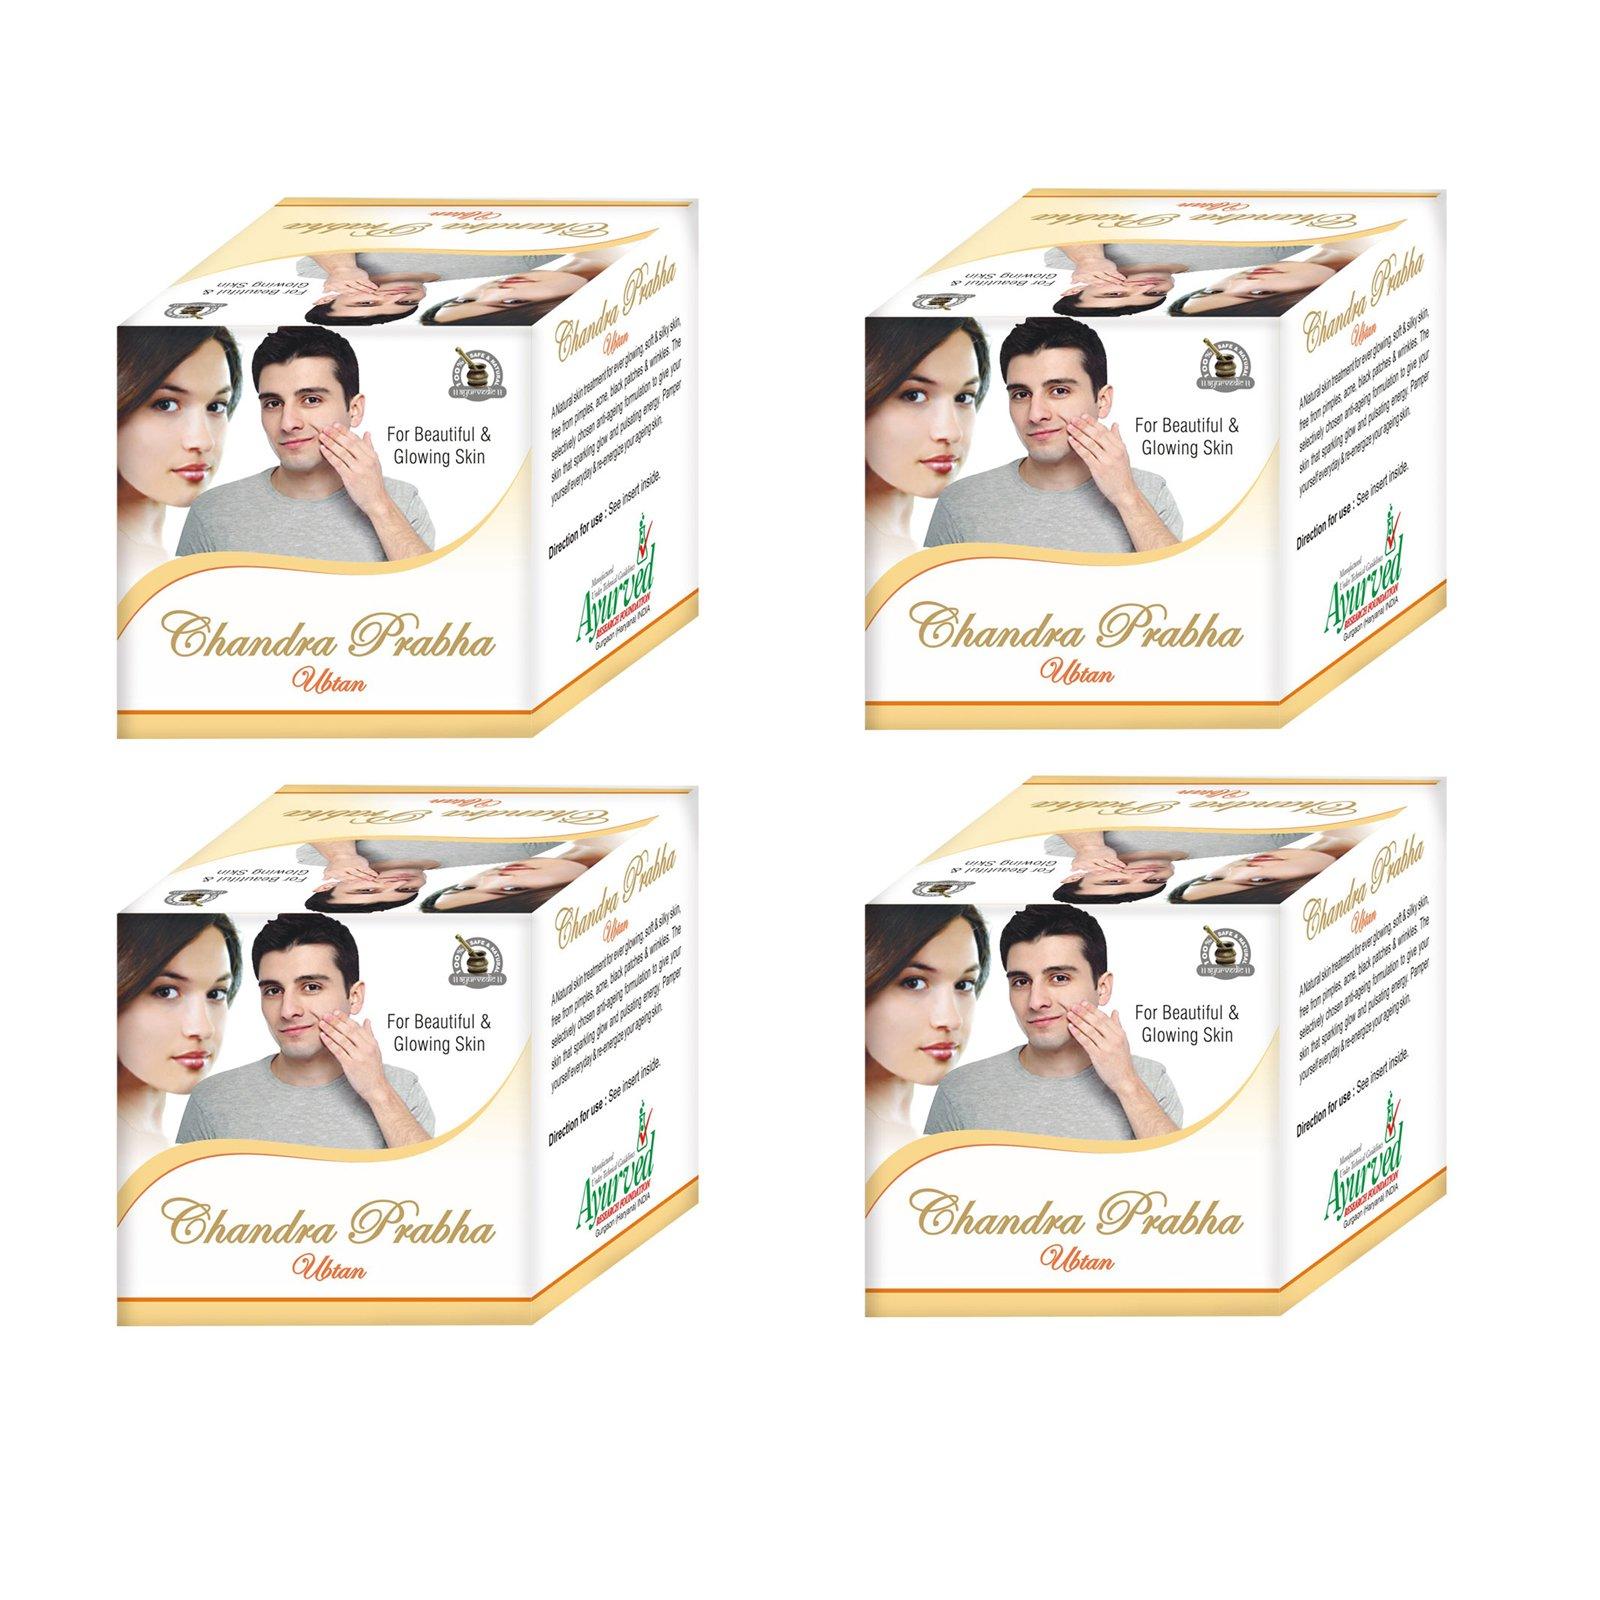 Ayurved Research Foundation Chandra Prabha Ubtan Herbal Skin Rejuvenating Face Pack 4 Packs of 50 Grams